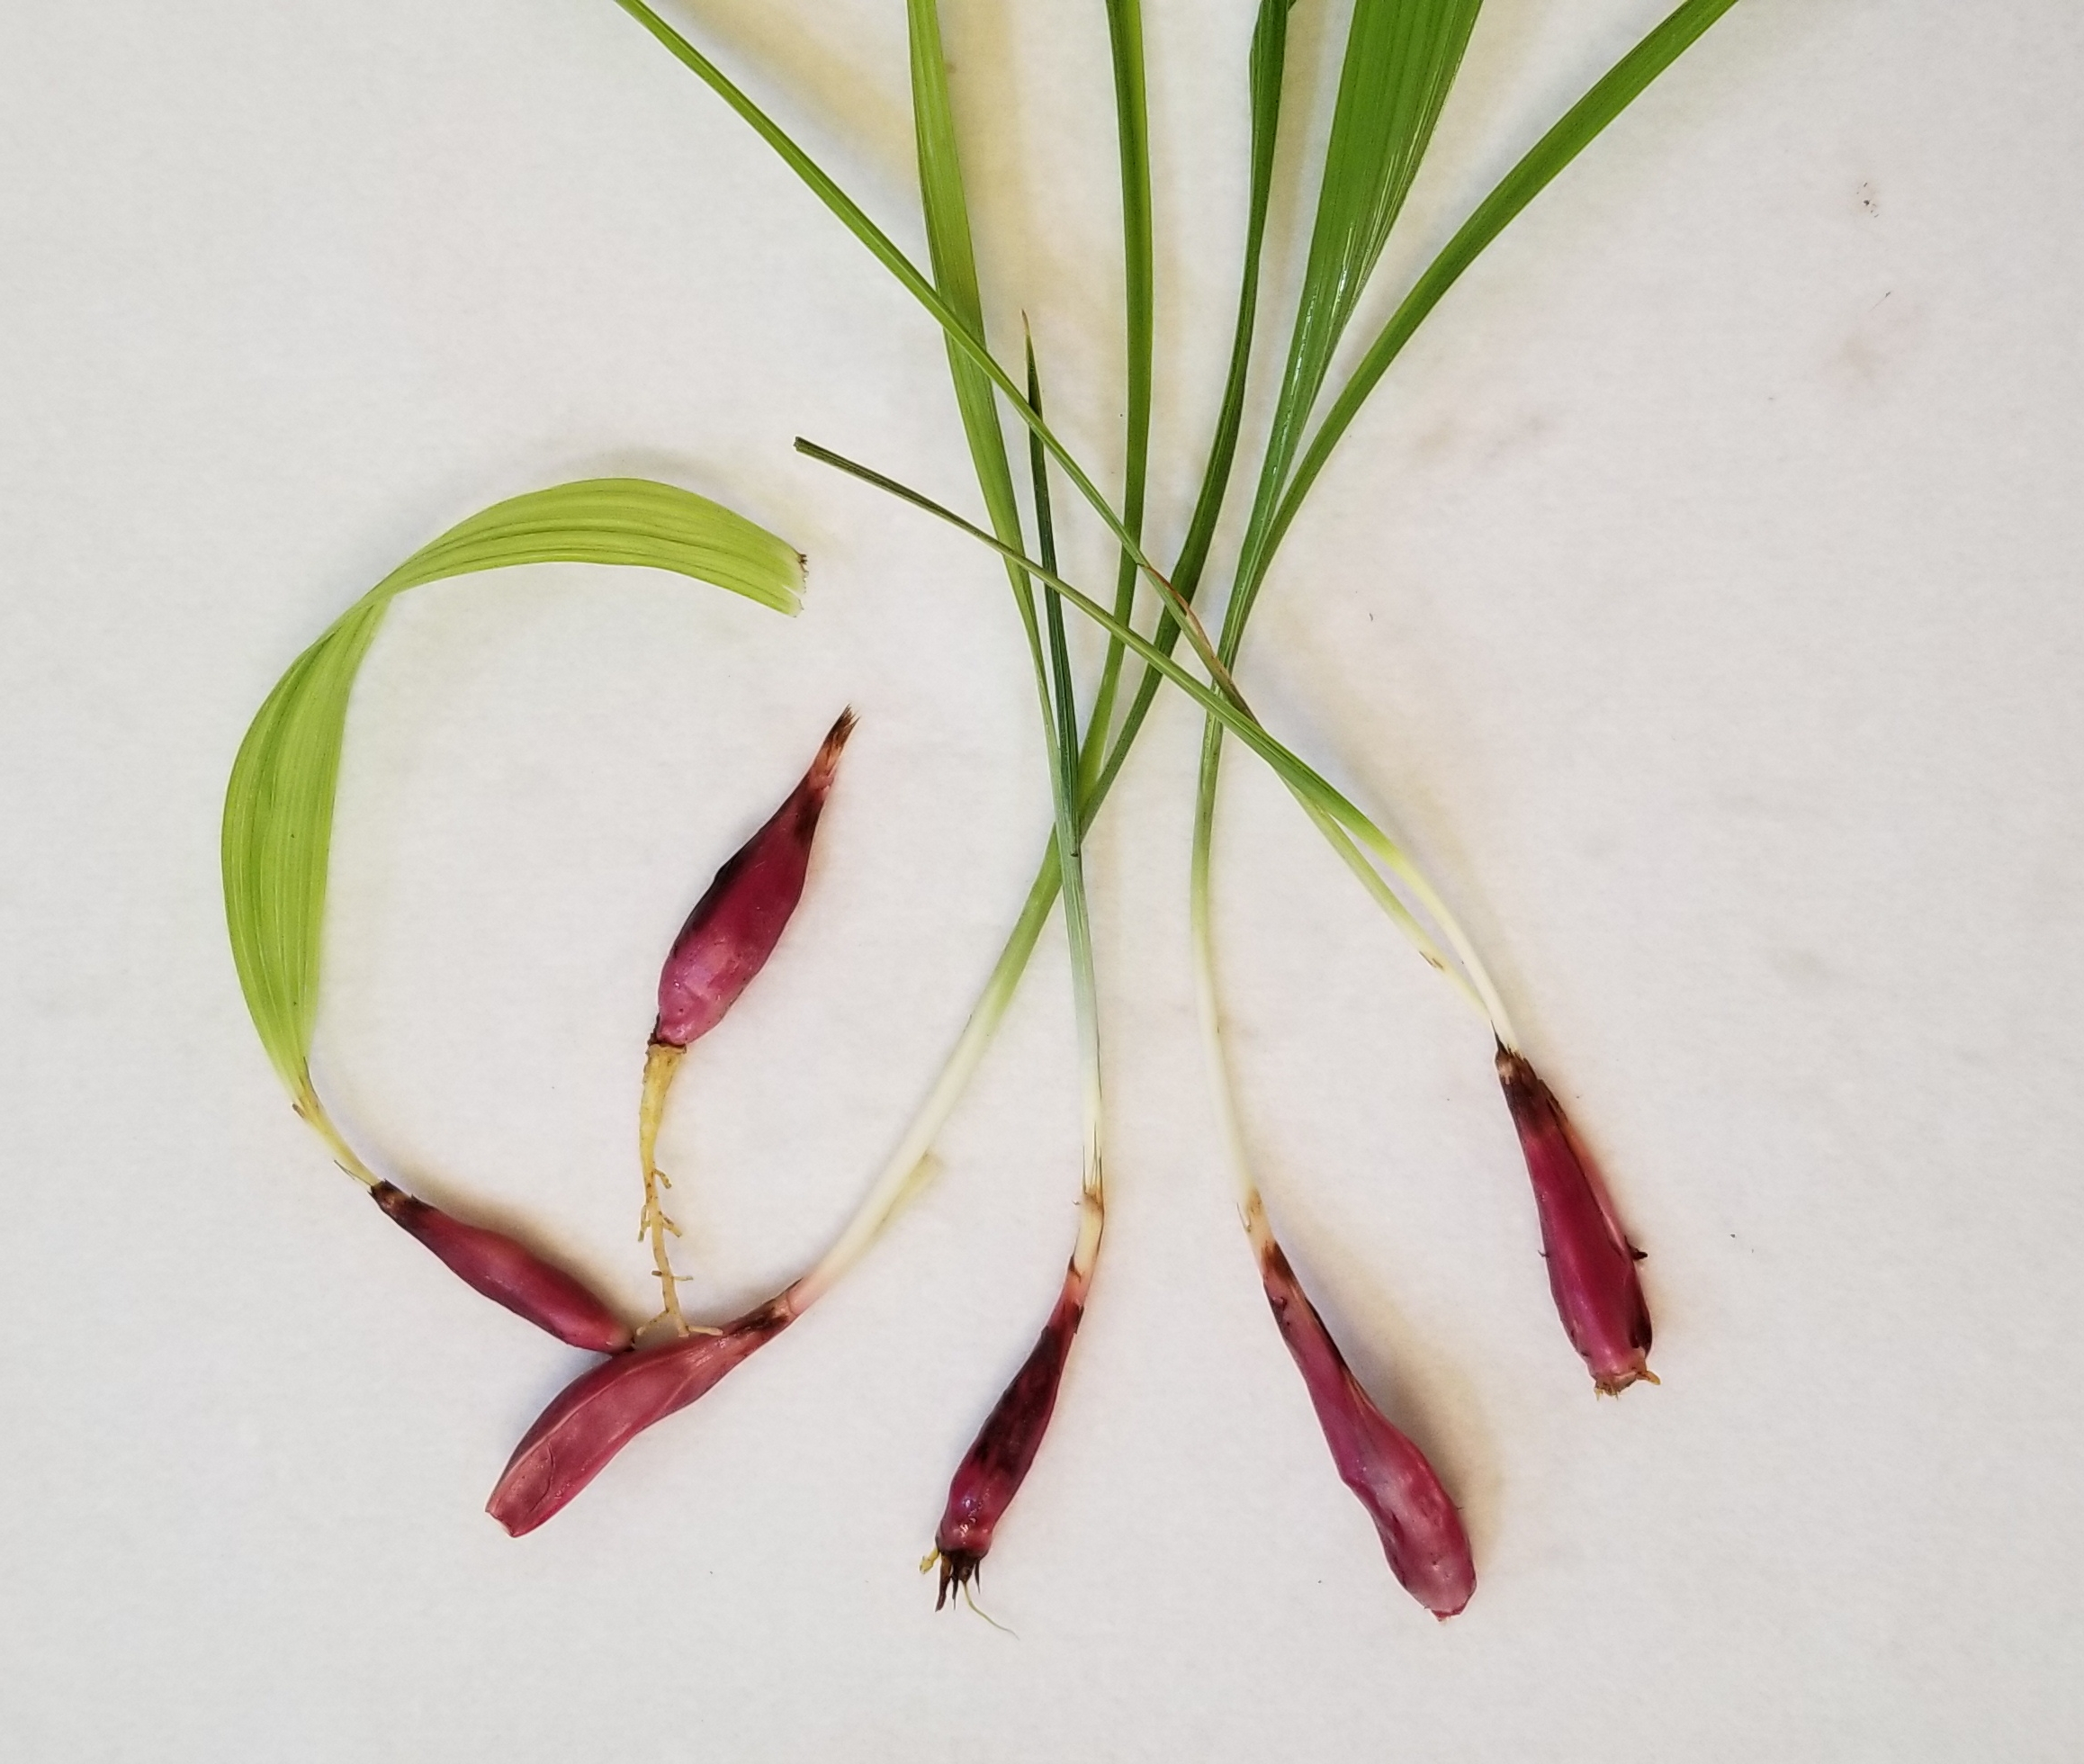 Dayak onion